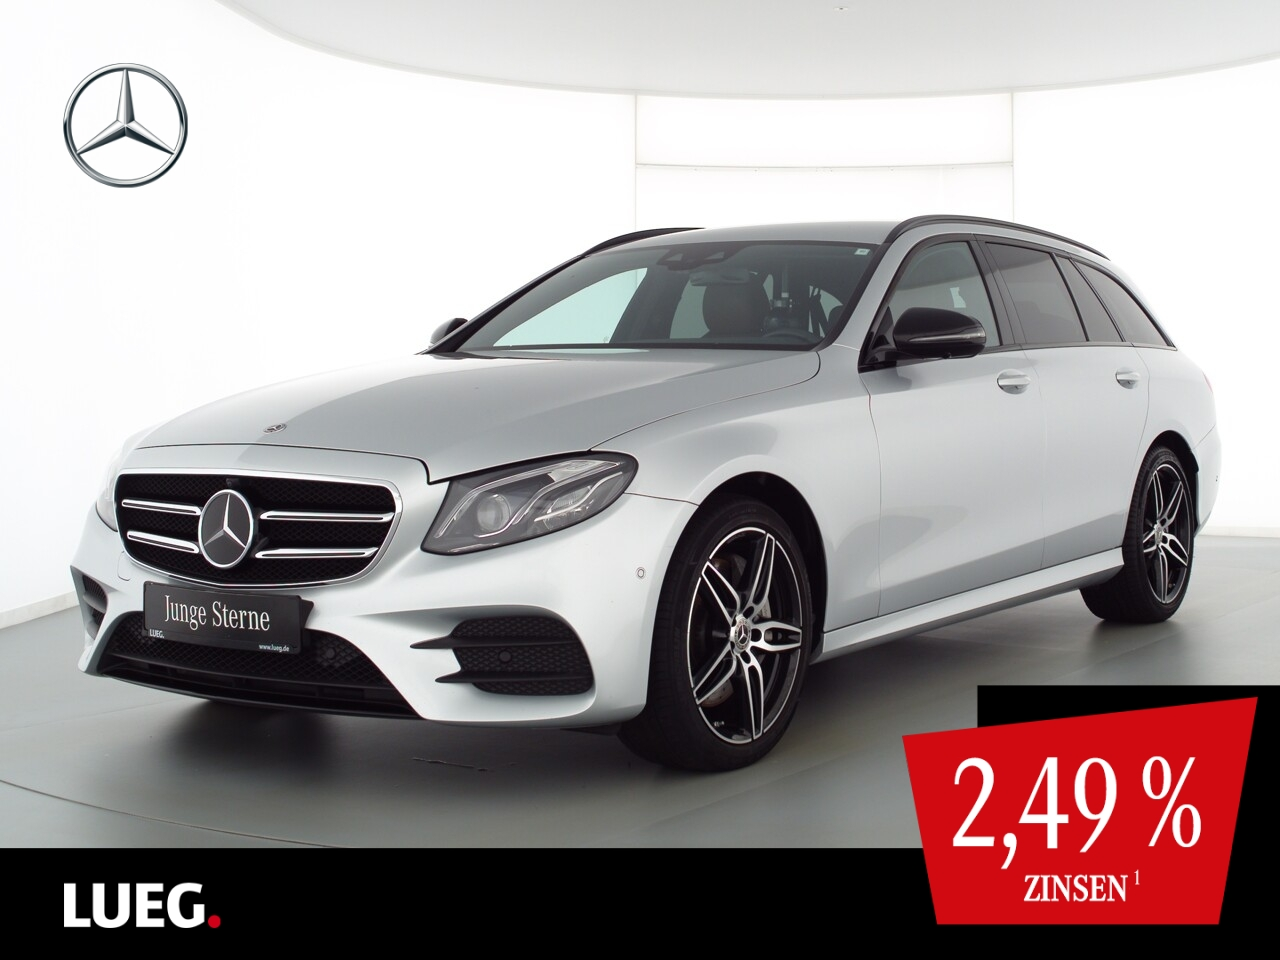 Mercedes-Benz E 350 d T AMG+COM+Mbeam+19''+DistrP+Airm+Wide+36, Jahr 2019, Diesel